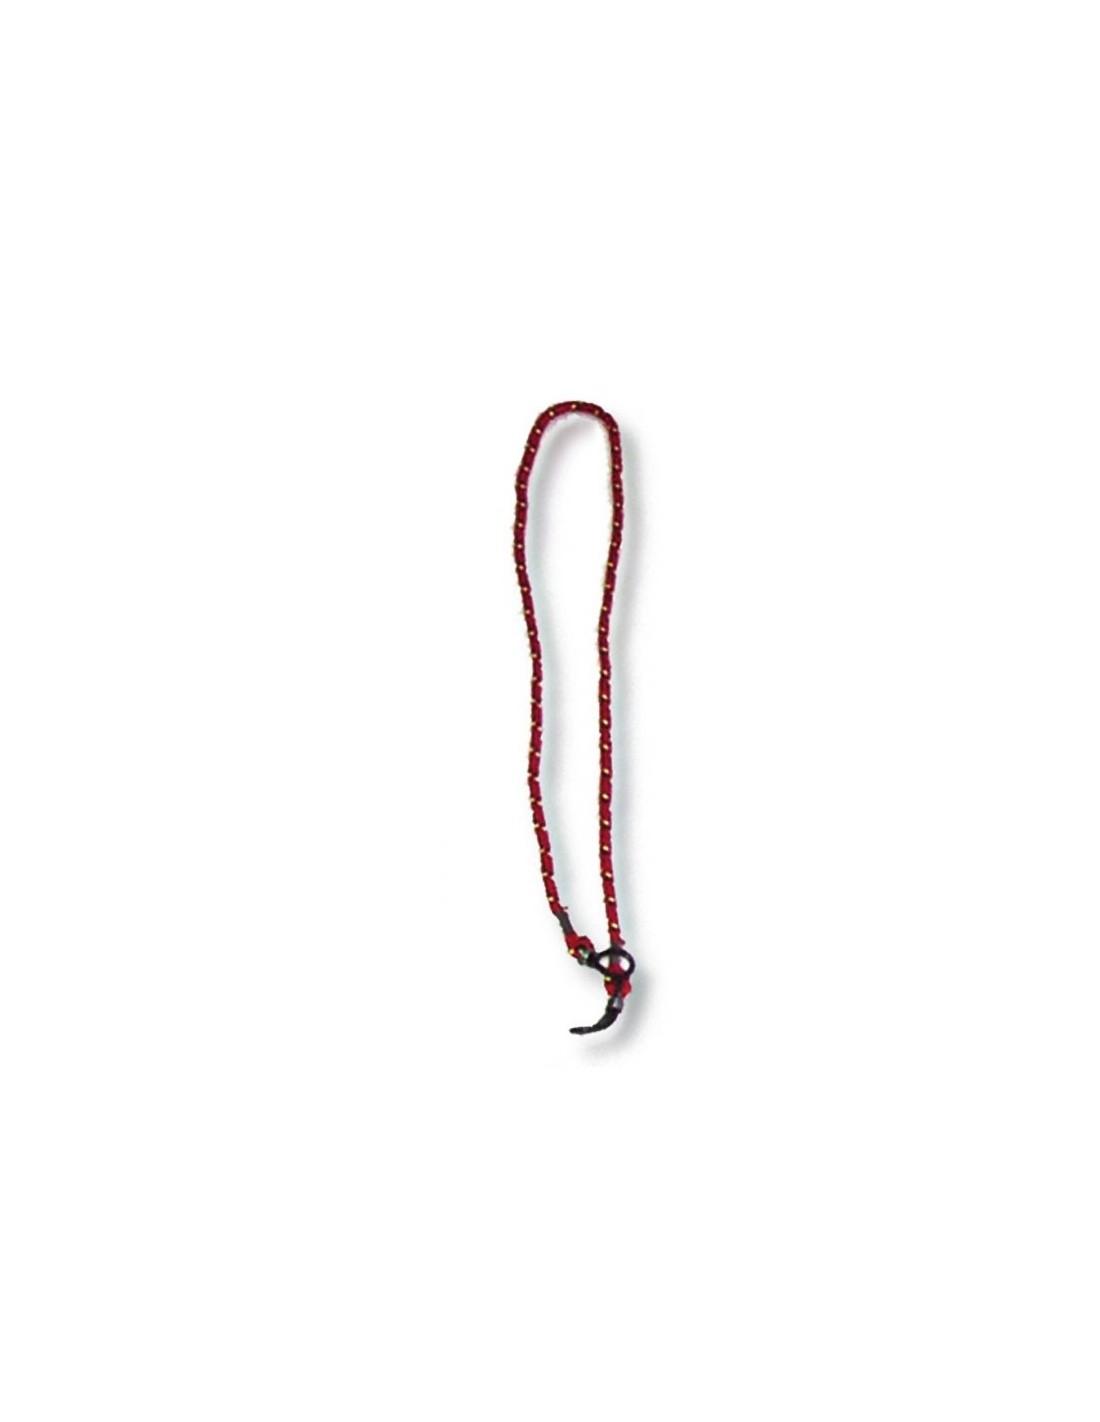 Brillenkoord - Rood - 60 cm - The Captain's Collection - Nautische Accessoires - 12.2299.00